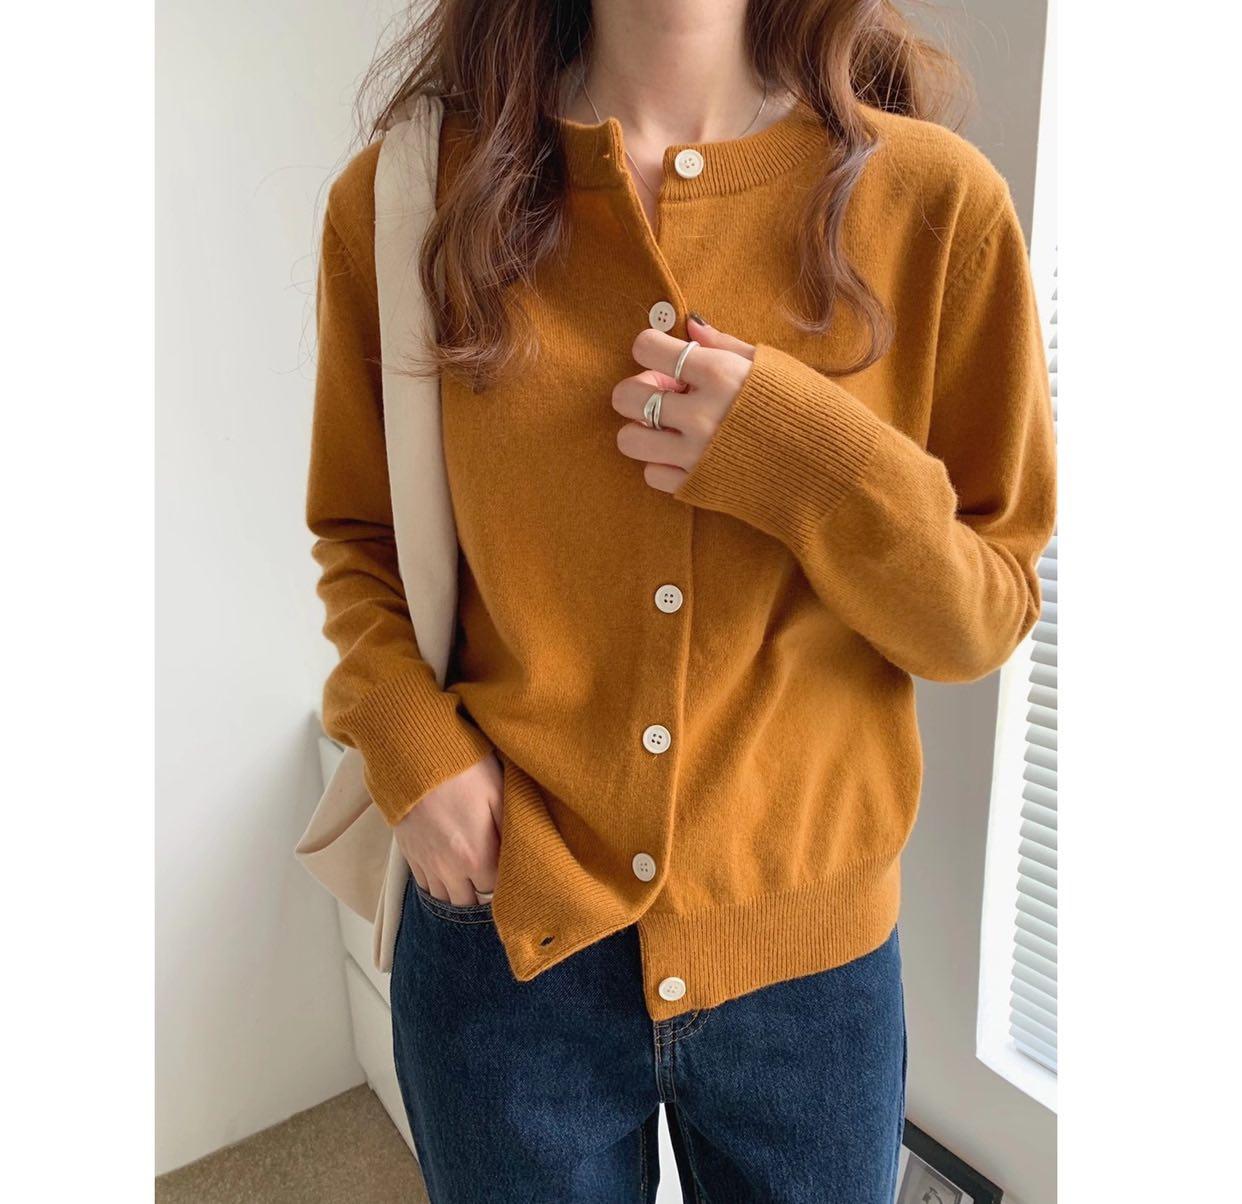 T2020秋季新韩版气质圆领排扣长袖宽松百搭羊毛针织开衫上衣女xh